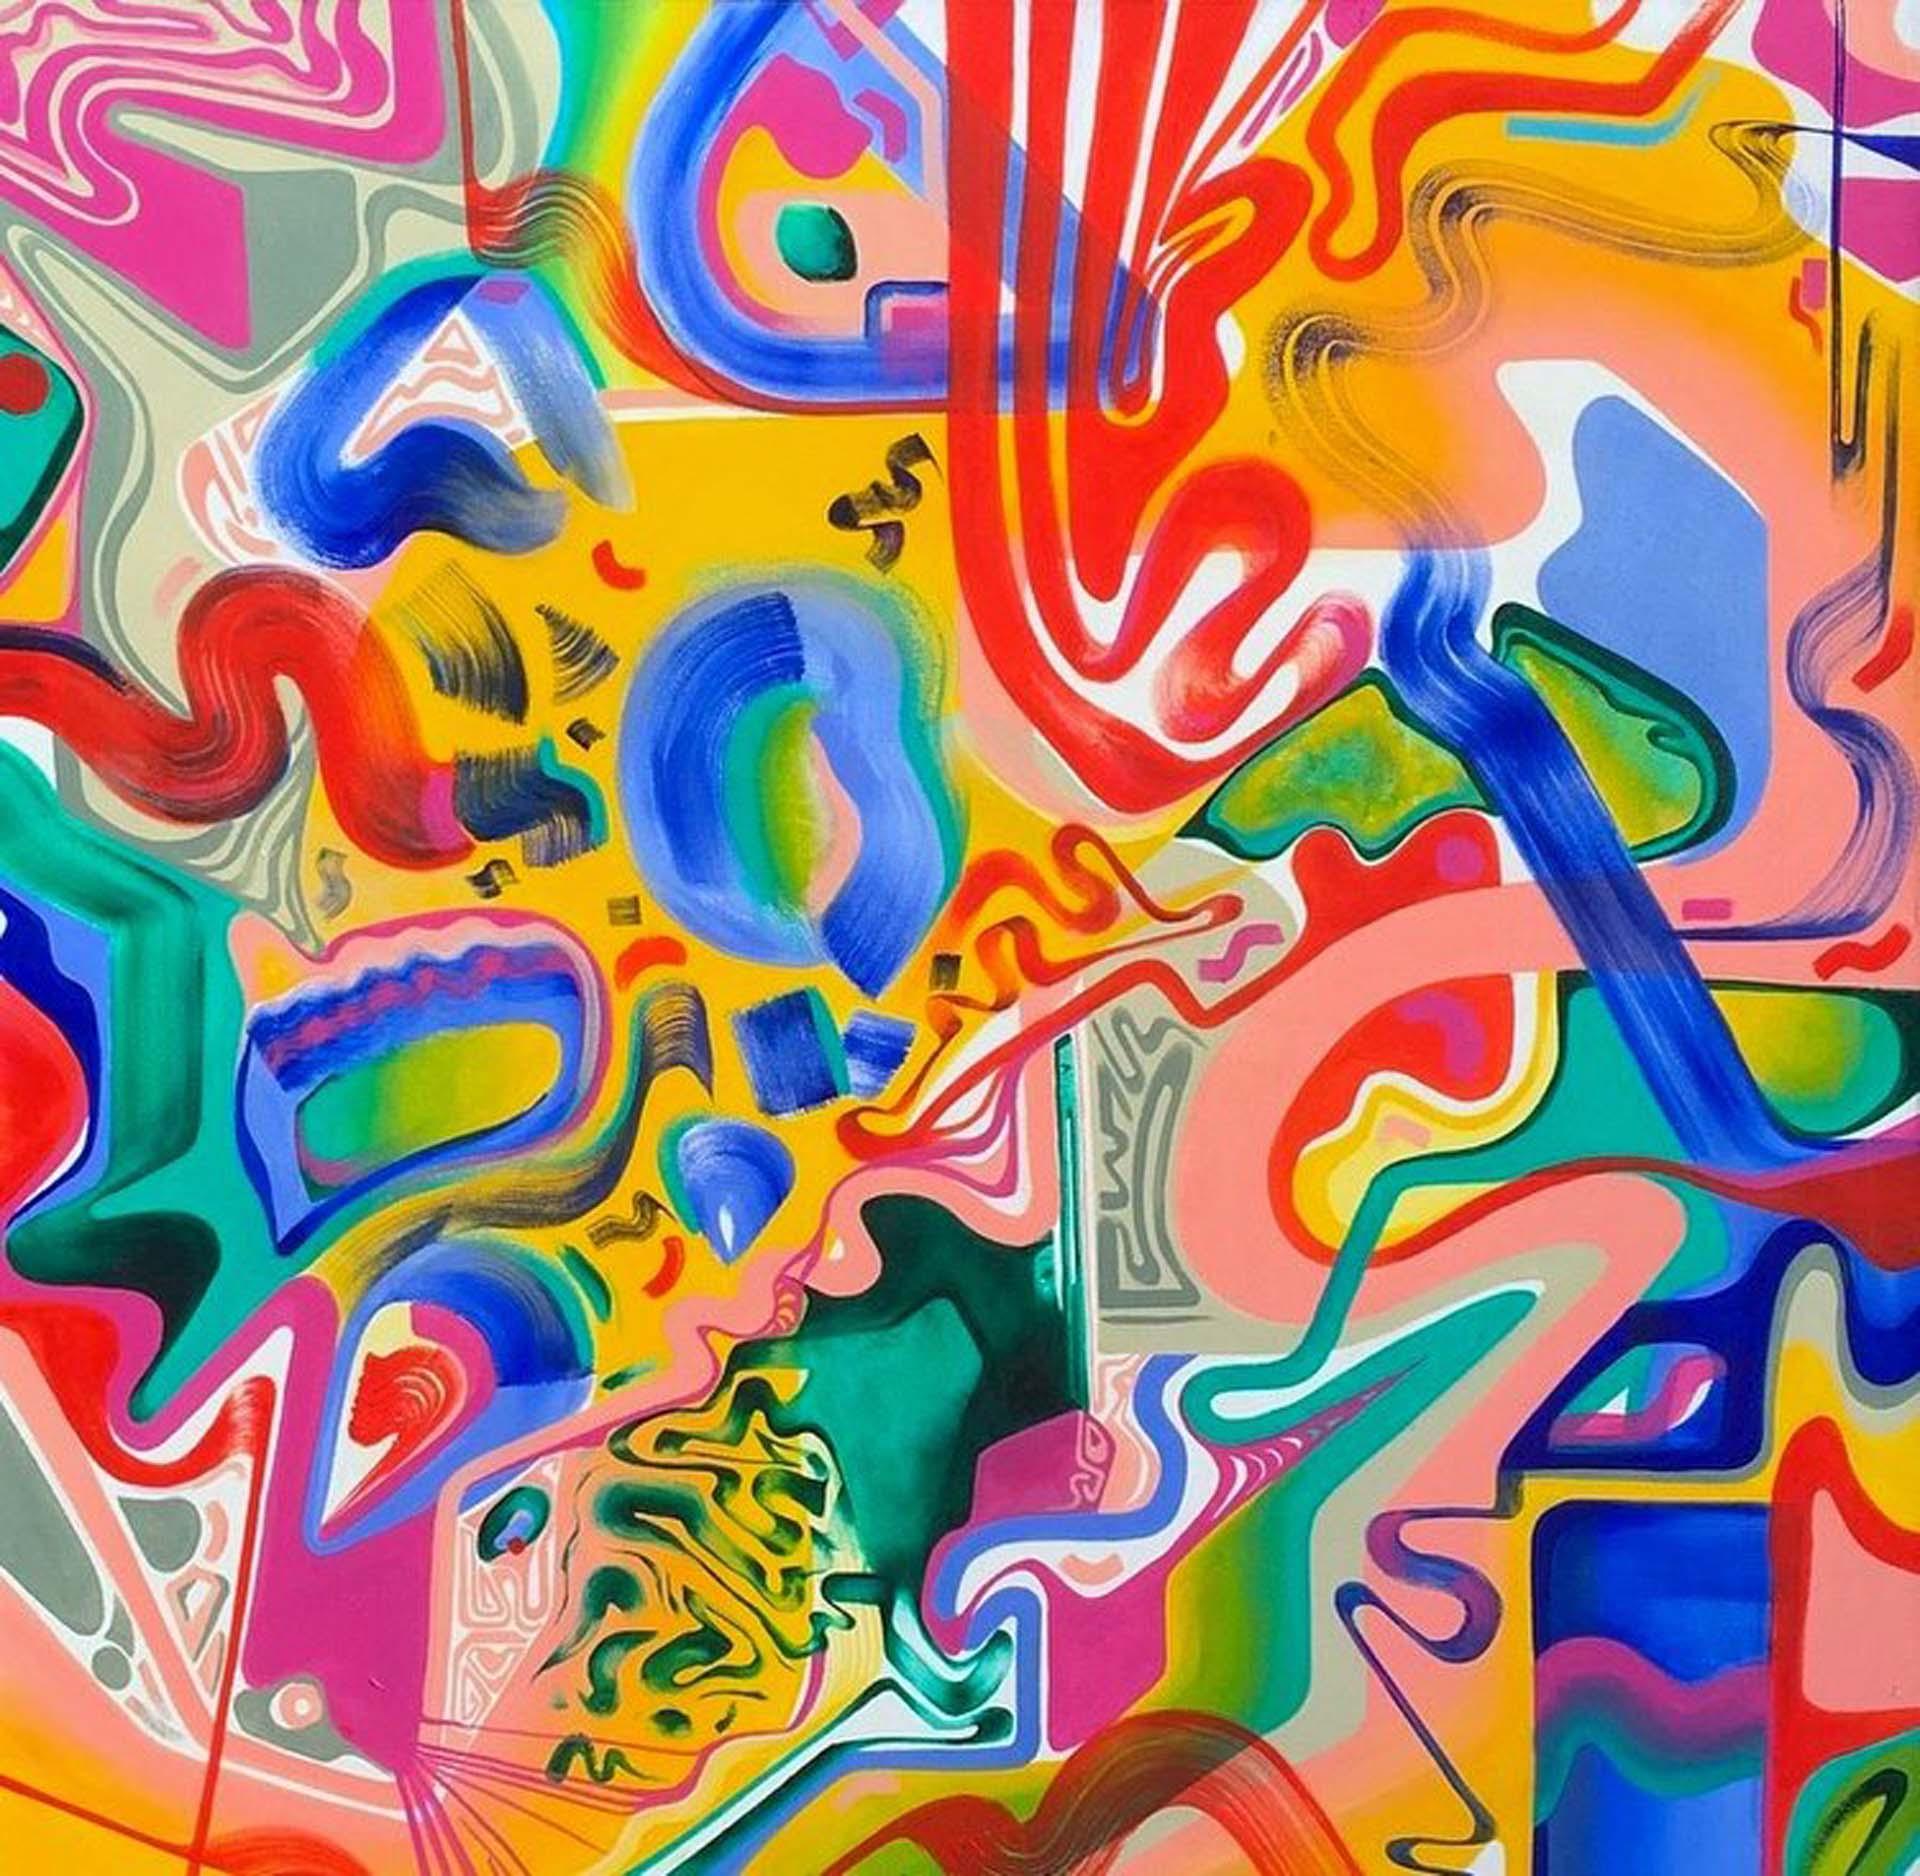 Jill Carlock art.JPG